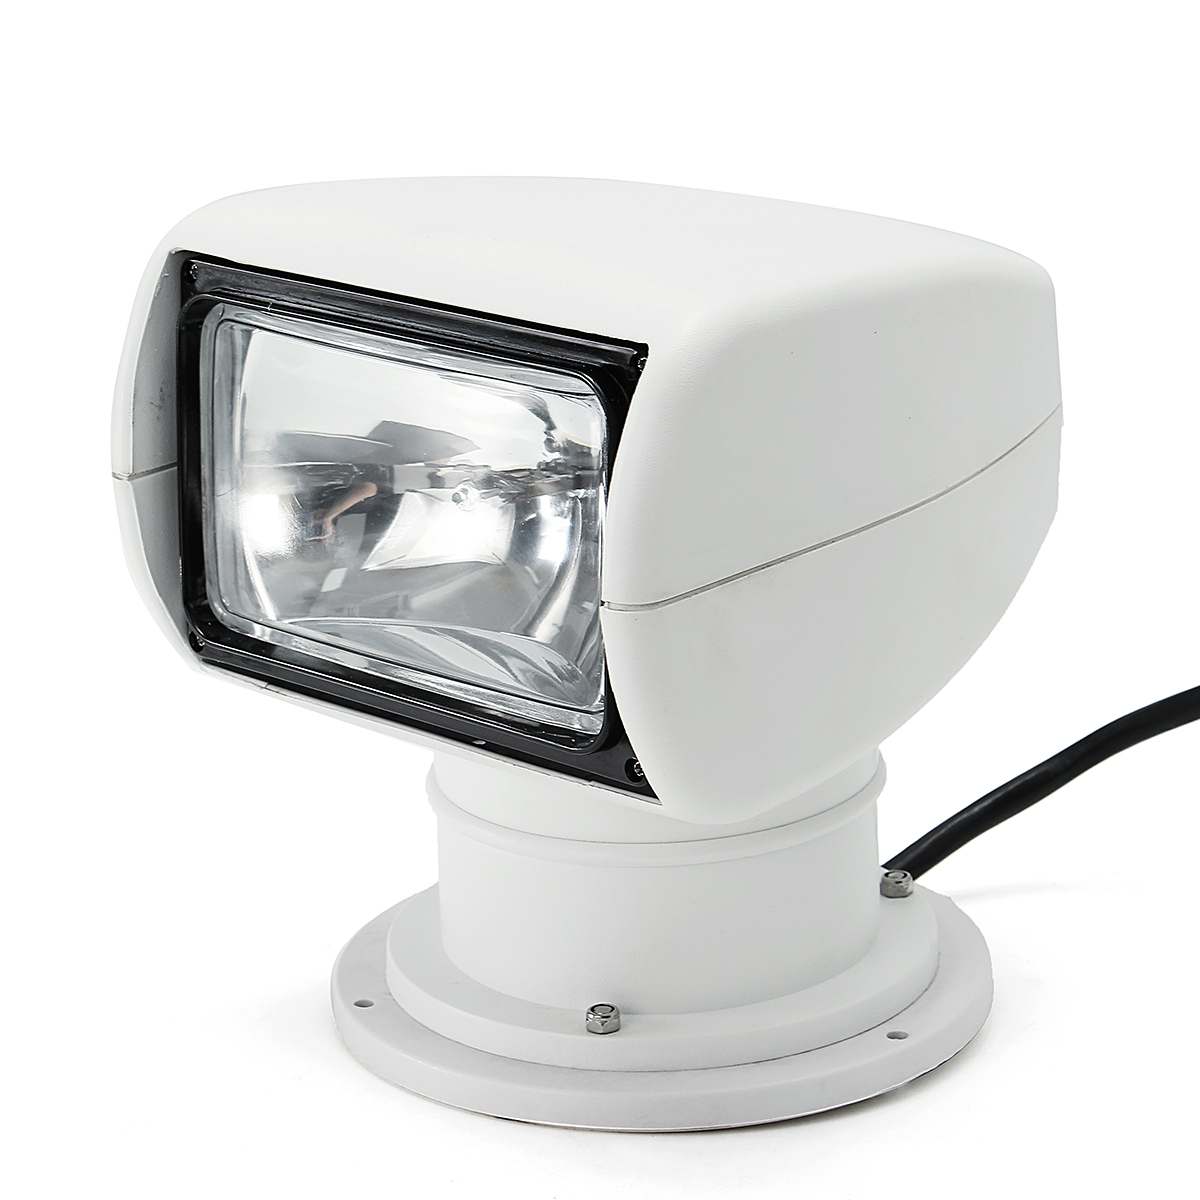 Image 3 - Smuxi Spotlight 12V 100W 2500LM 3200K Marine Searchlight Light Bulb PC+Aluminum Remote Control Multi angled White-in LED Spotlights from Lights & Lighting